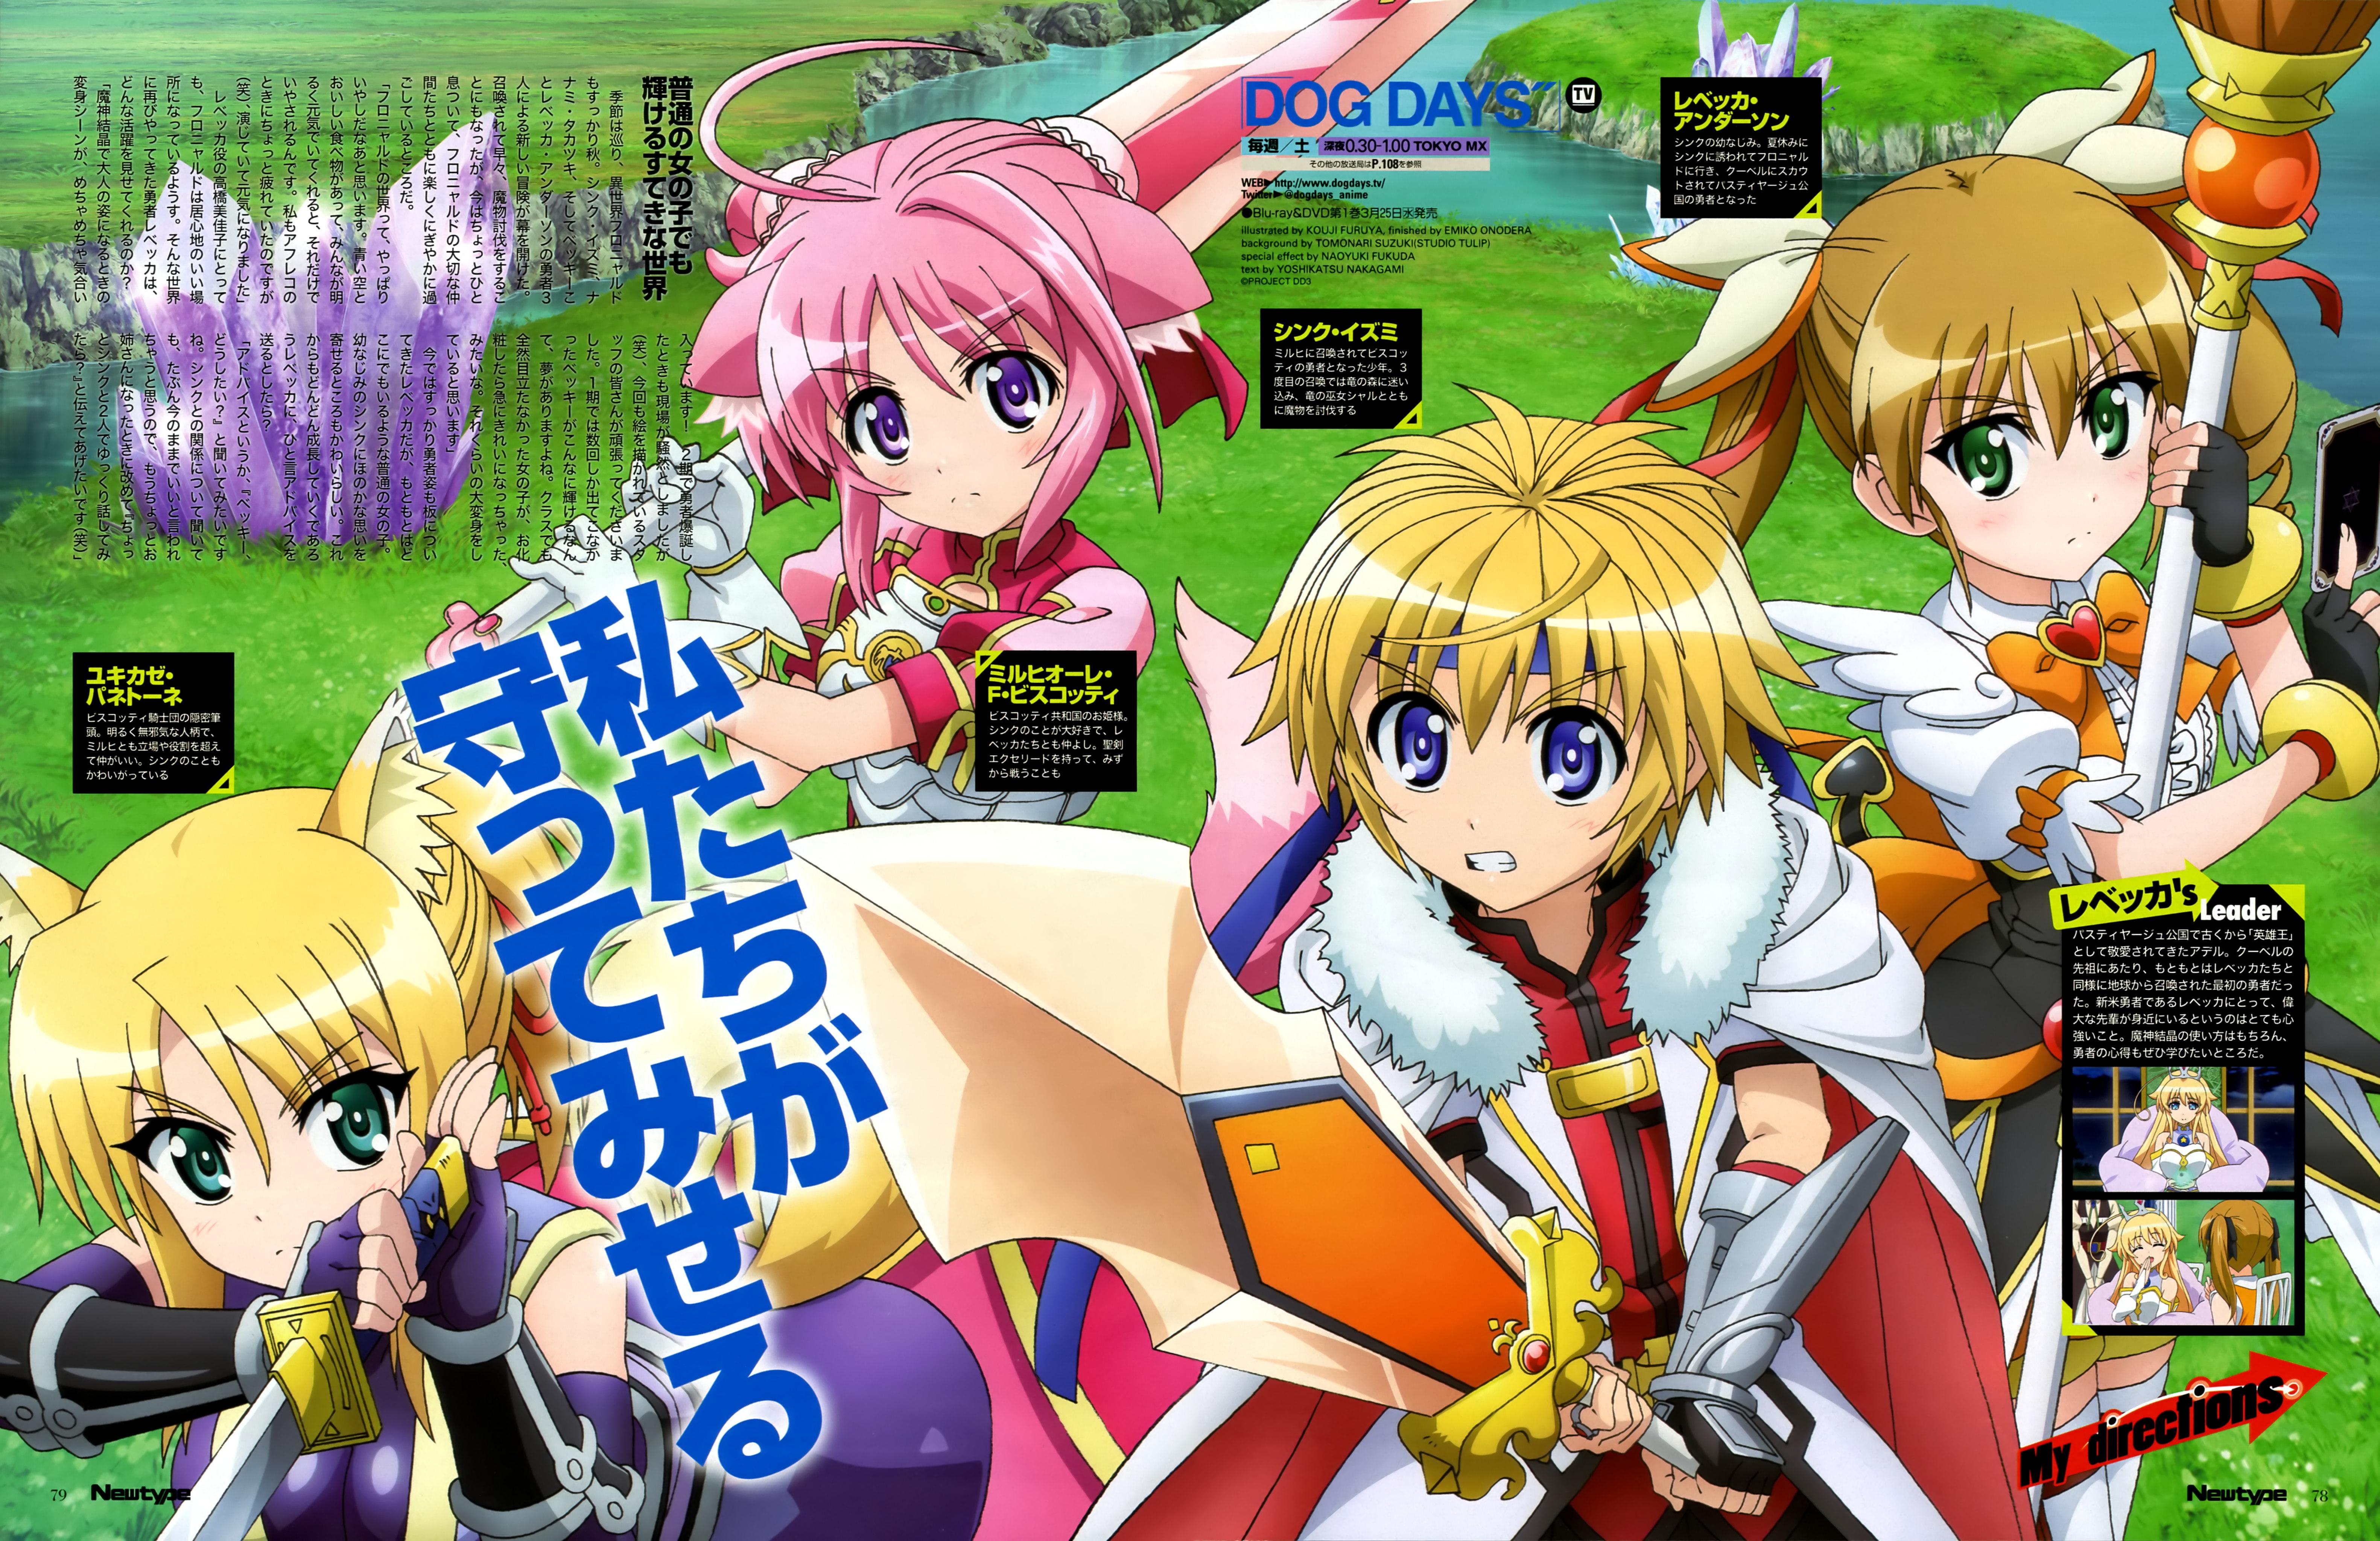 Tags Anime Seven Arcs DOG DAYS Yukikaze Panettone Millhiore Firianno Biscotti